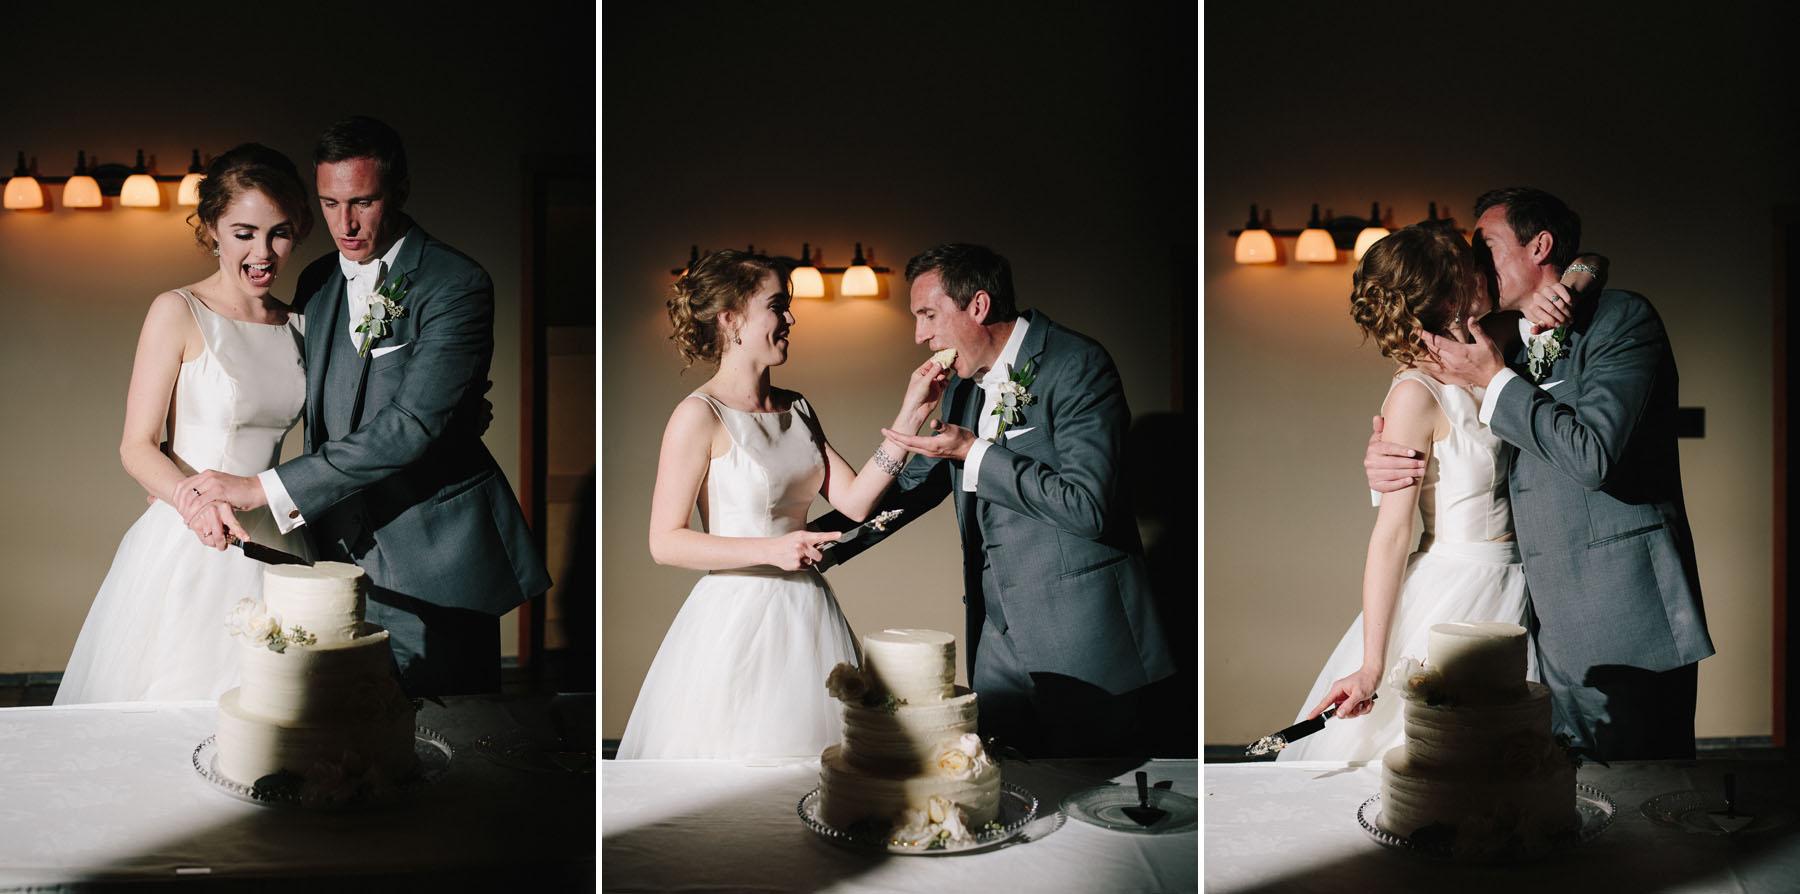 thetis-island-wedding-photographer-rp-rn-188.jpg